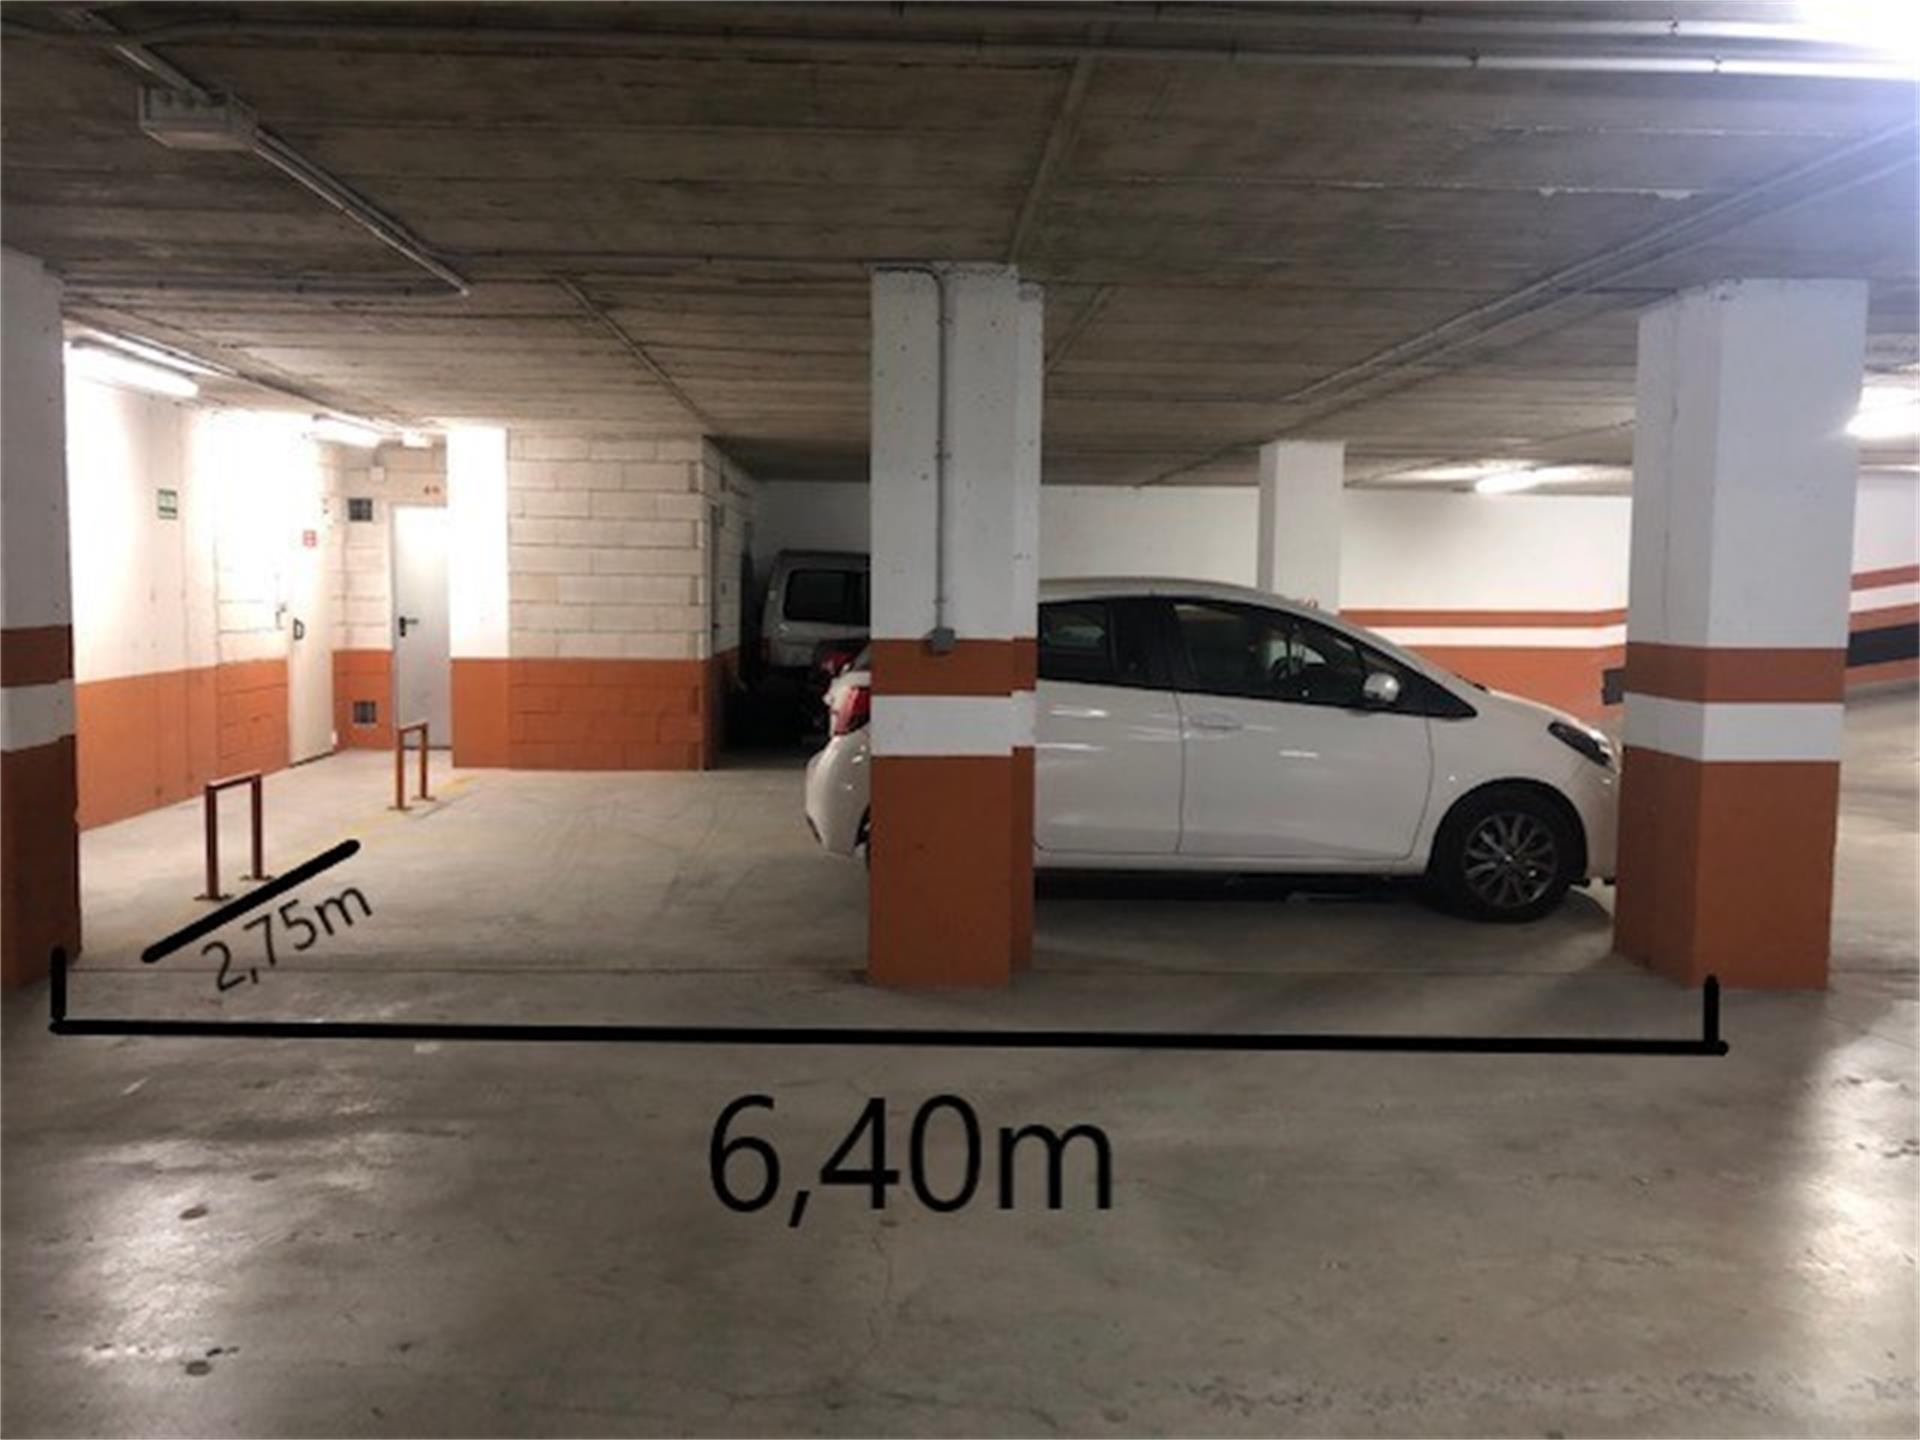 Alquiler Parking coche  Carrer alfons el magnànim. Amanecer - l'olivera / carrer alfons el magnànim